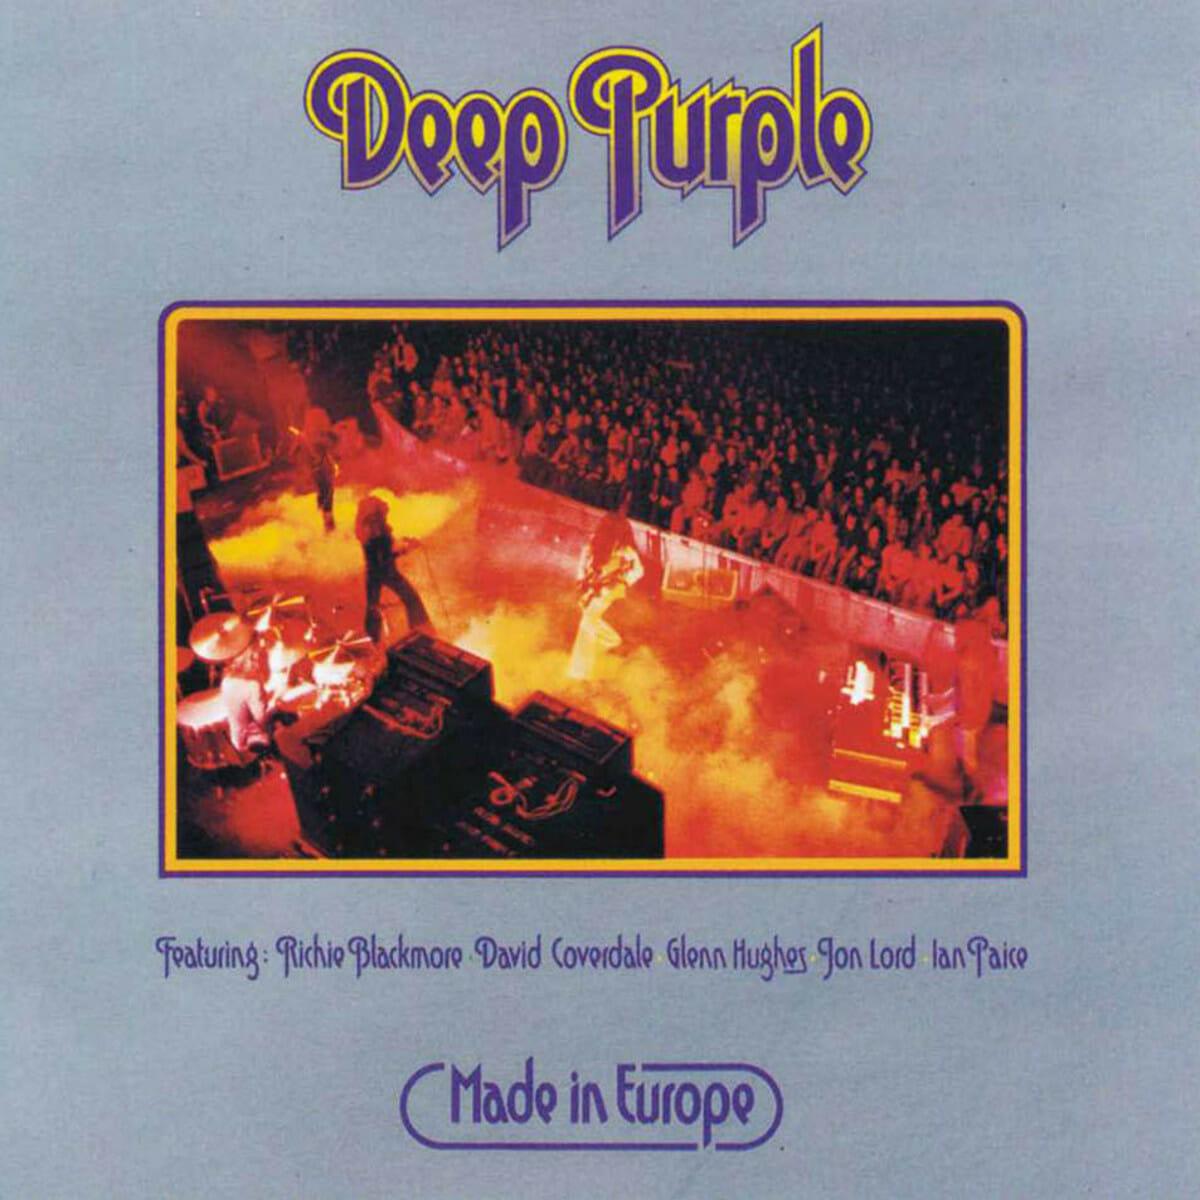 Deep Purple Made in Europe Album Cover